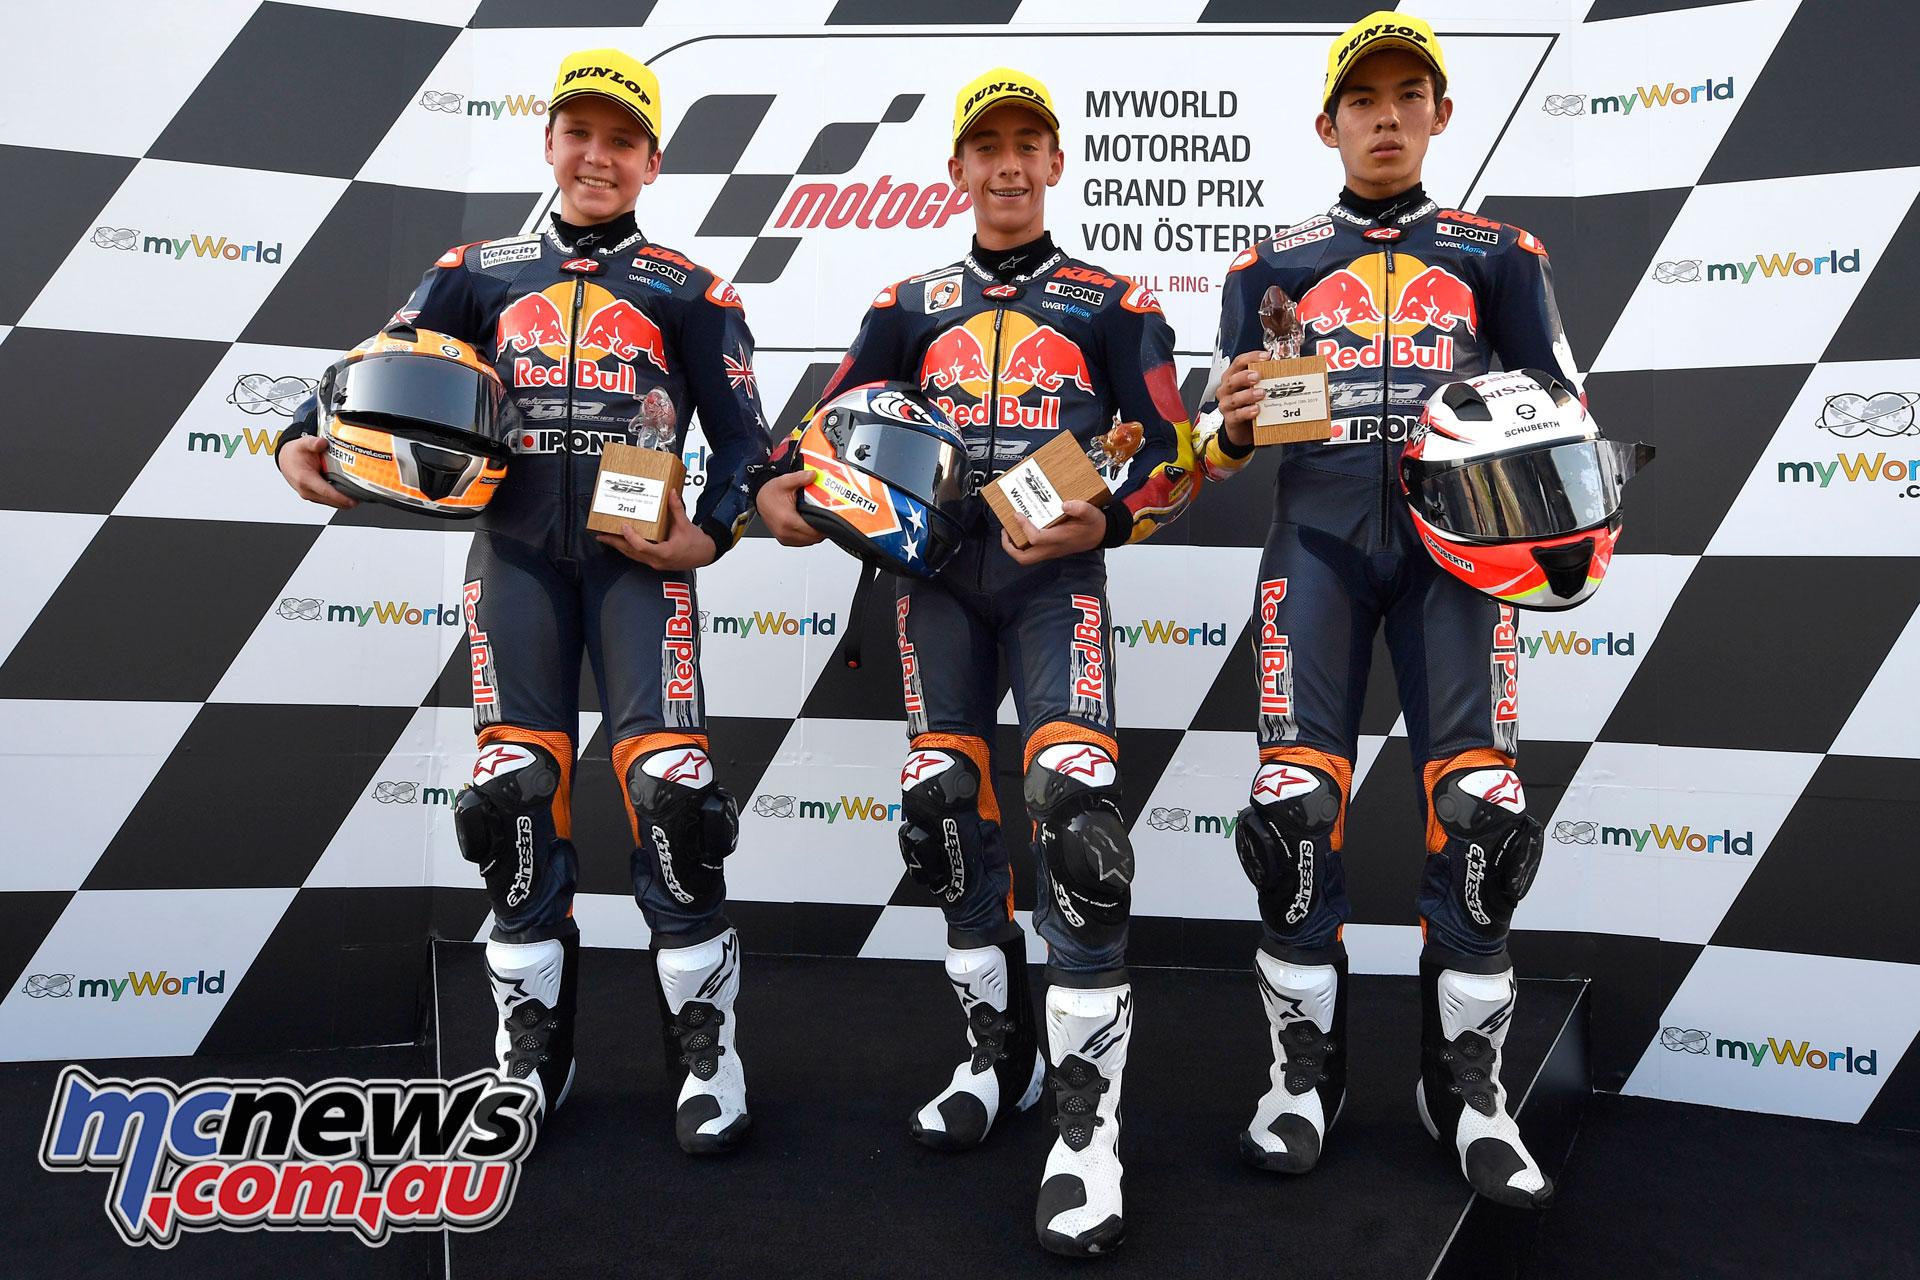 Red Bull Rookies Cup Rnd Austria Race Podium